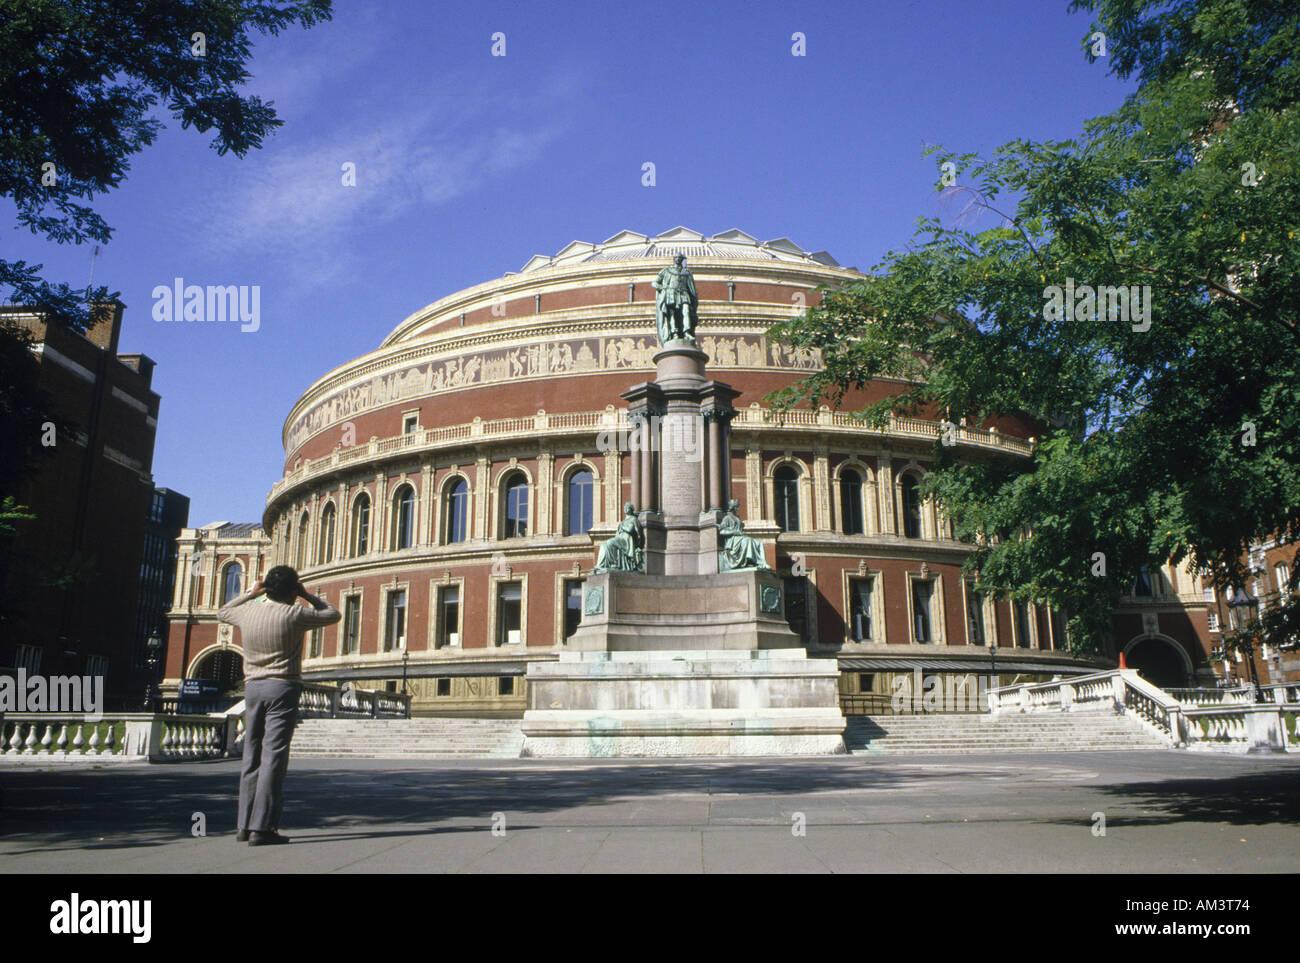 ALBERT HALL Kensington Road London - Stock Image